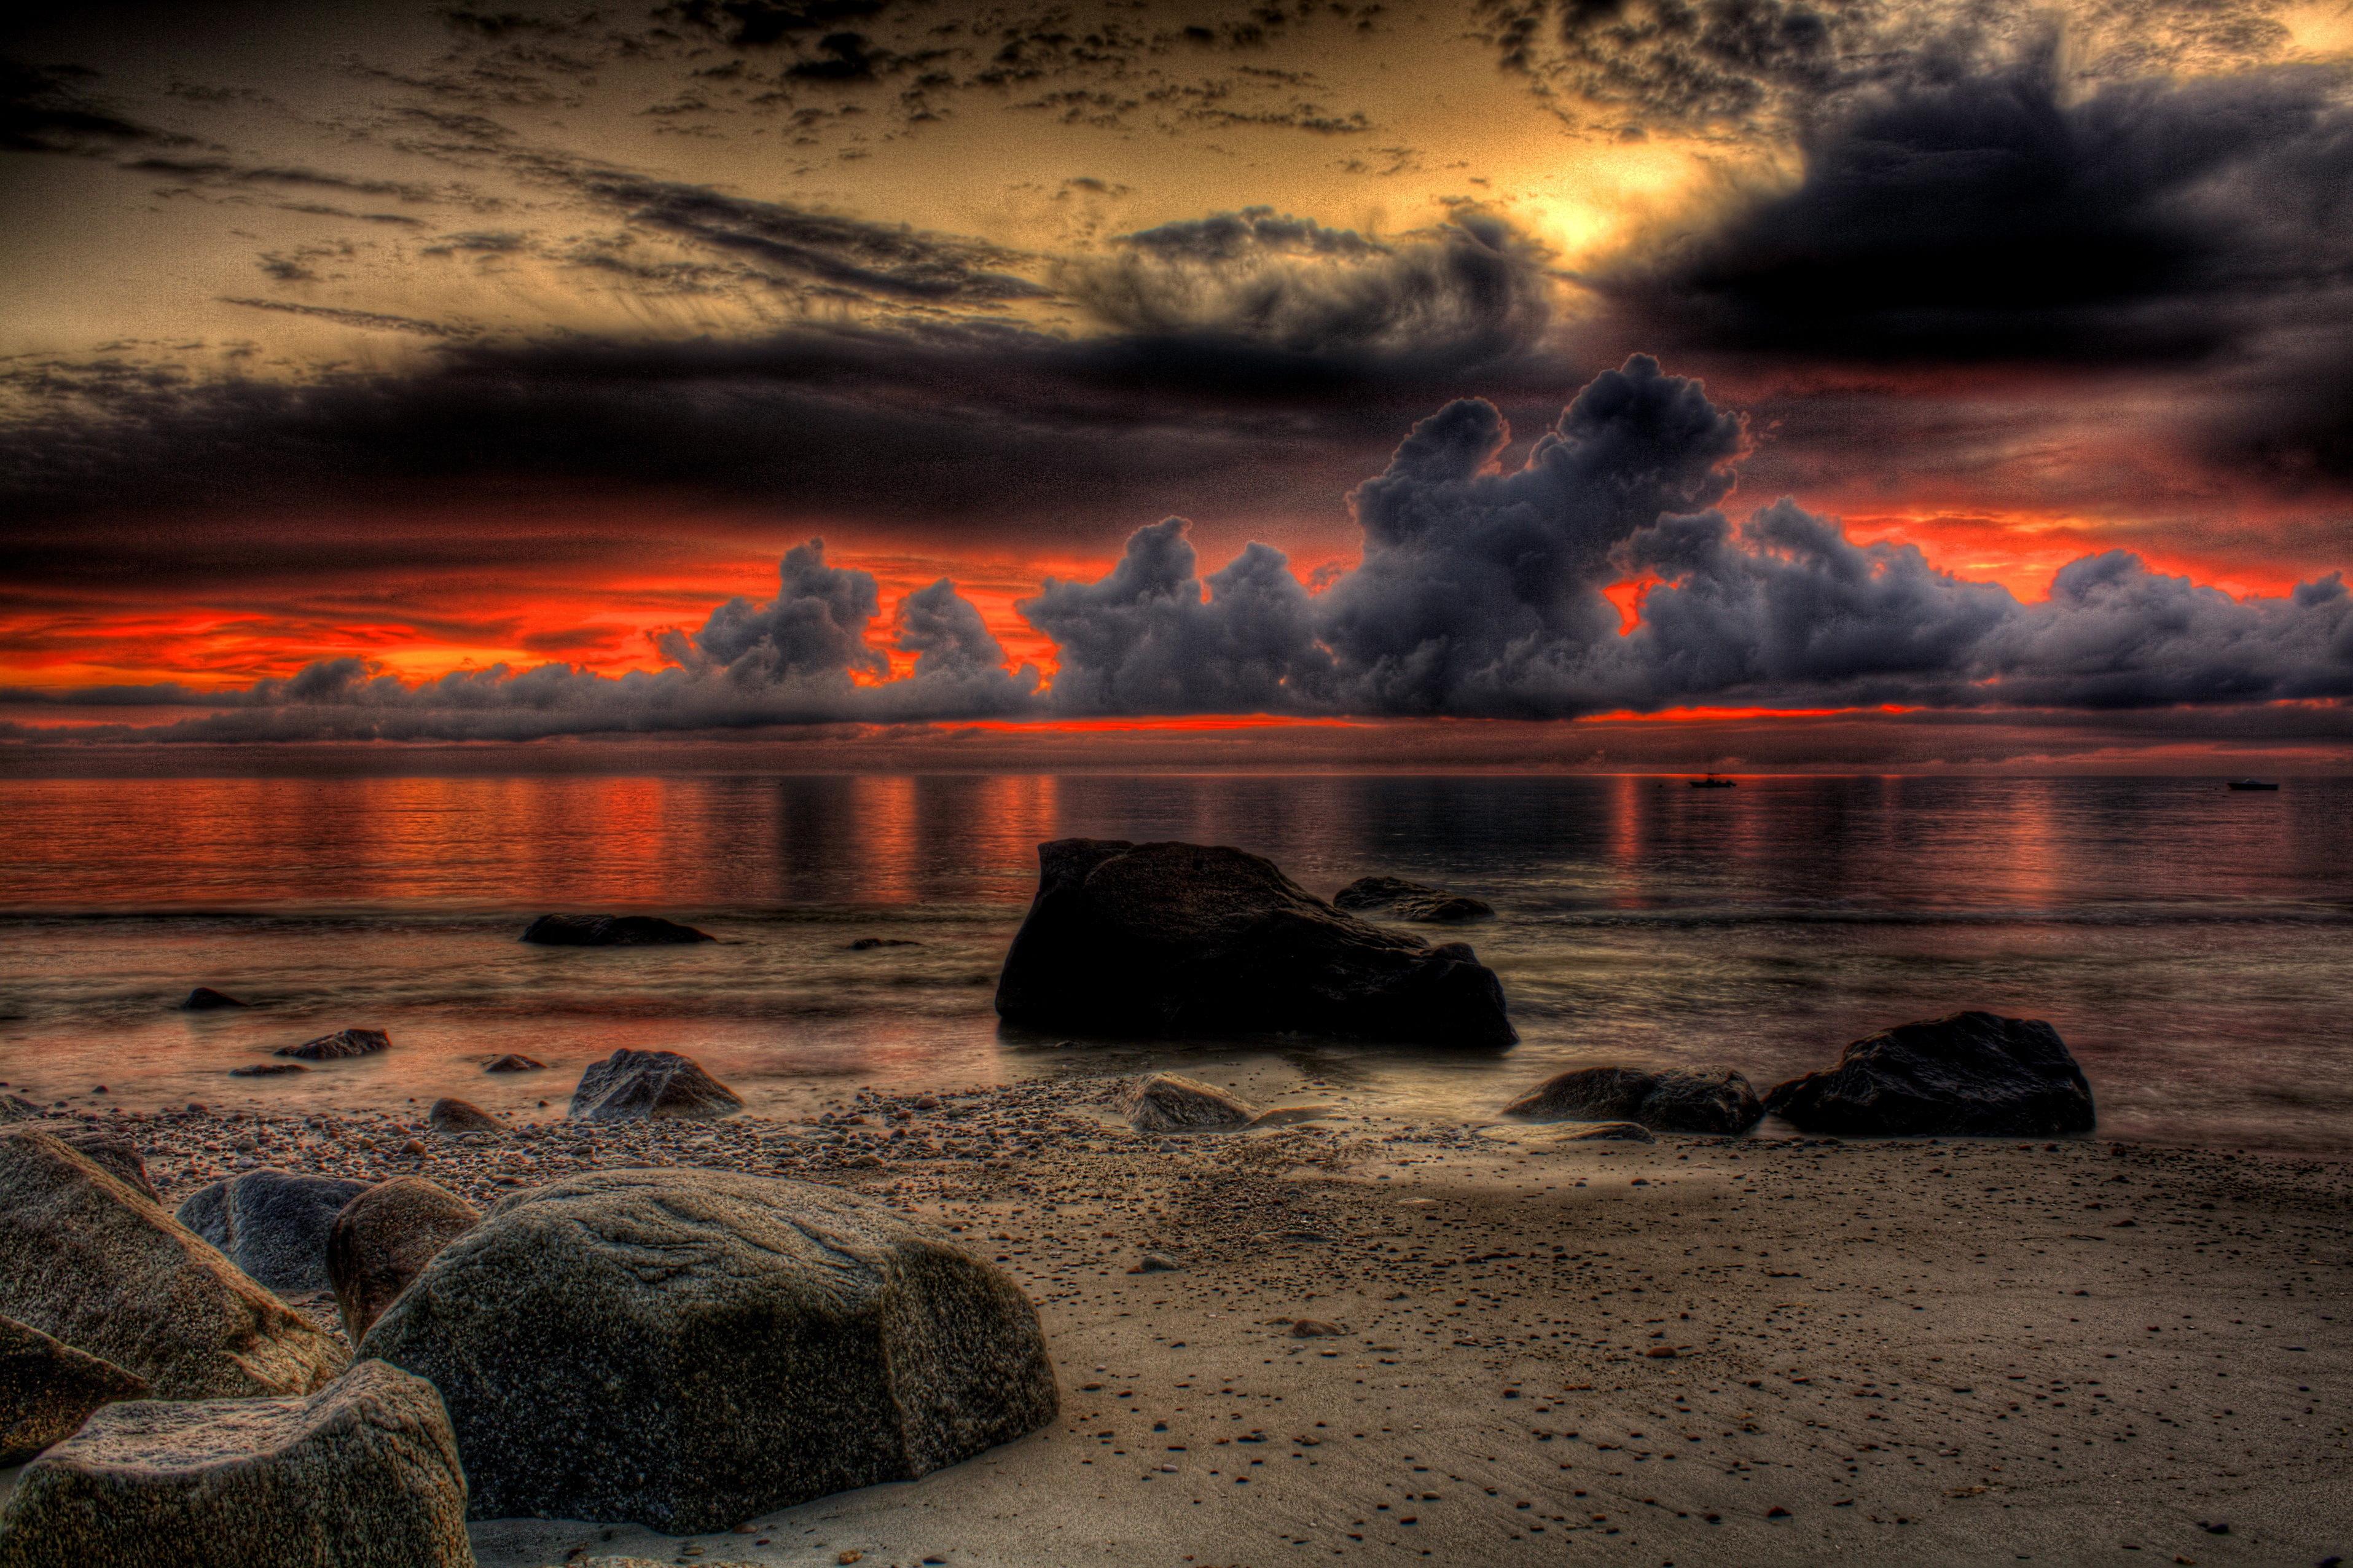 море океан камни скалы закат sea the ocean stones rock sunset  № 2530630 загрузить